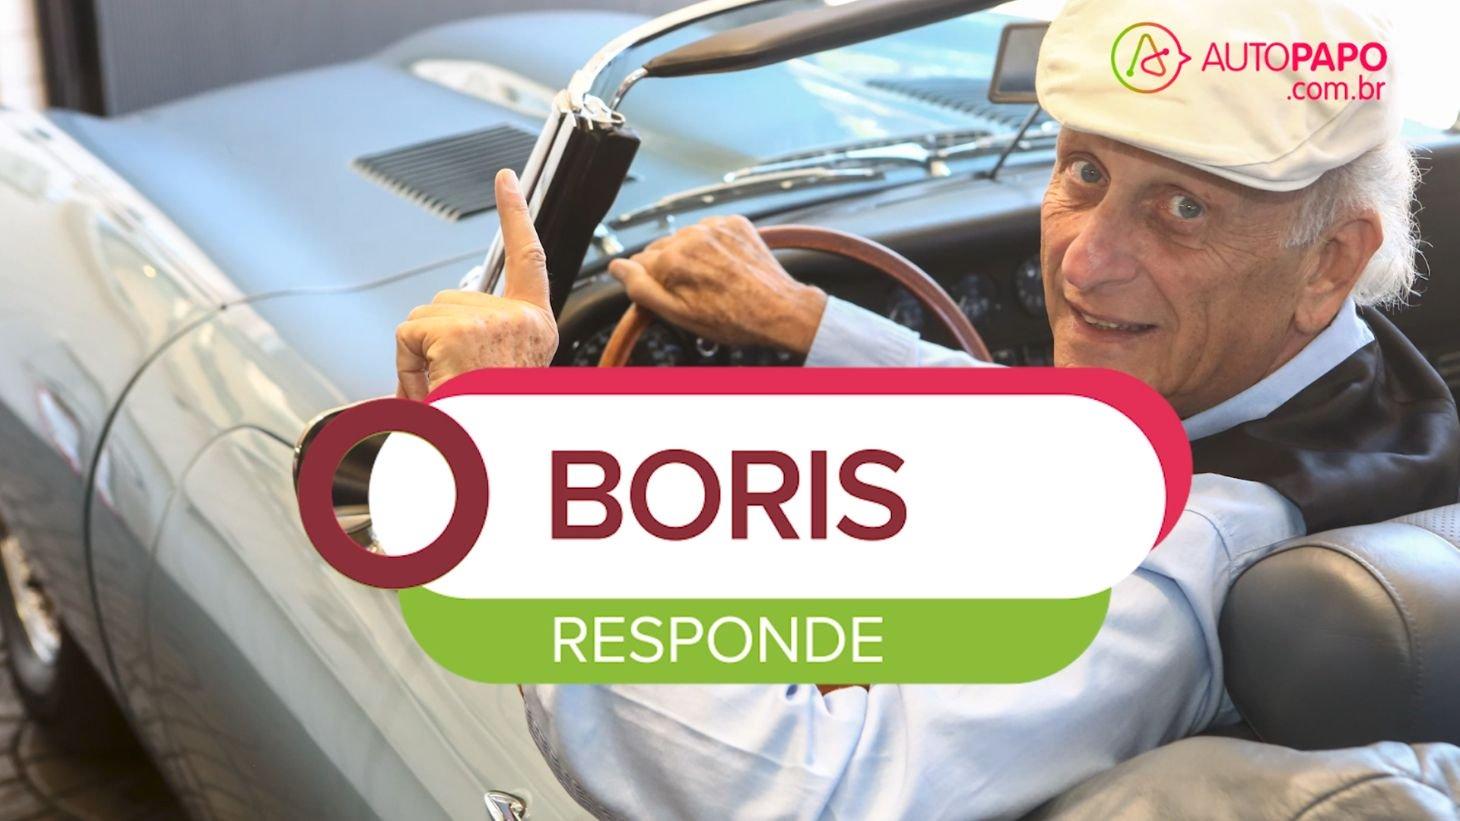 boris responde